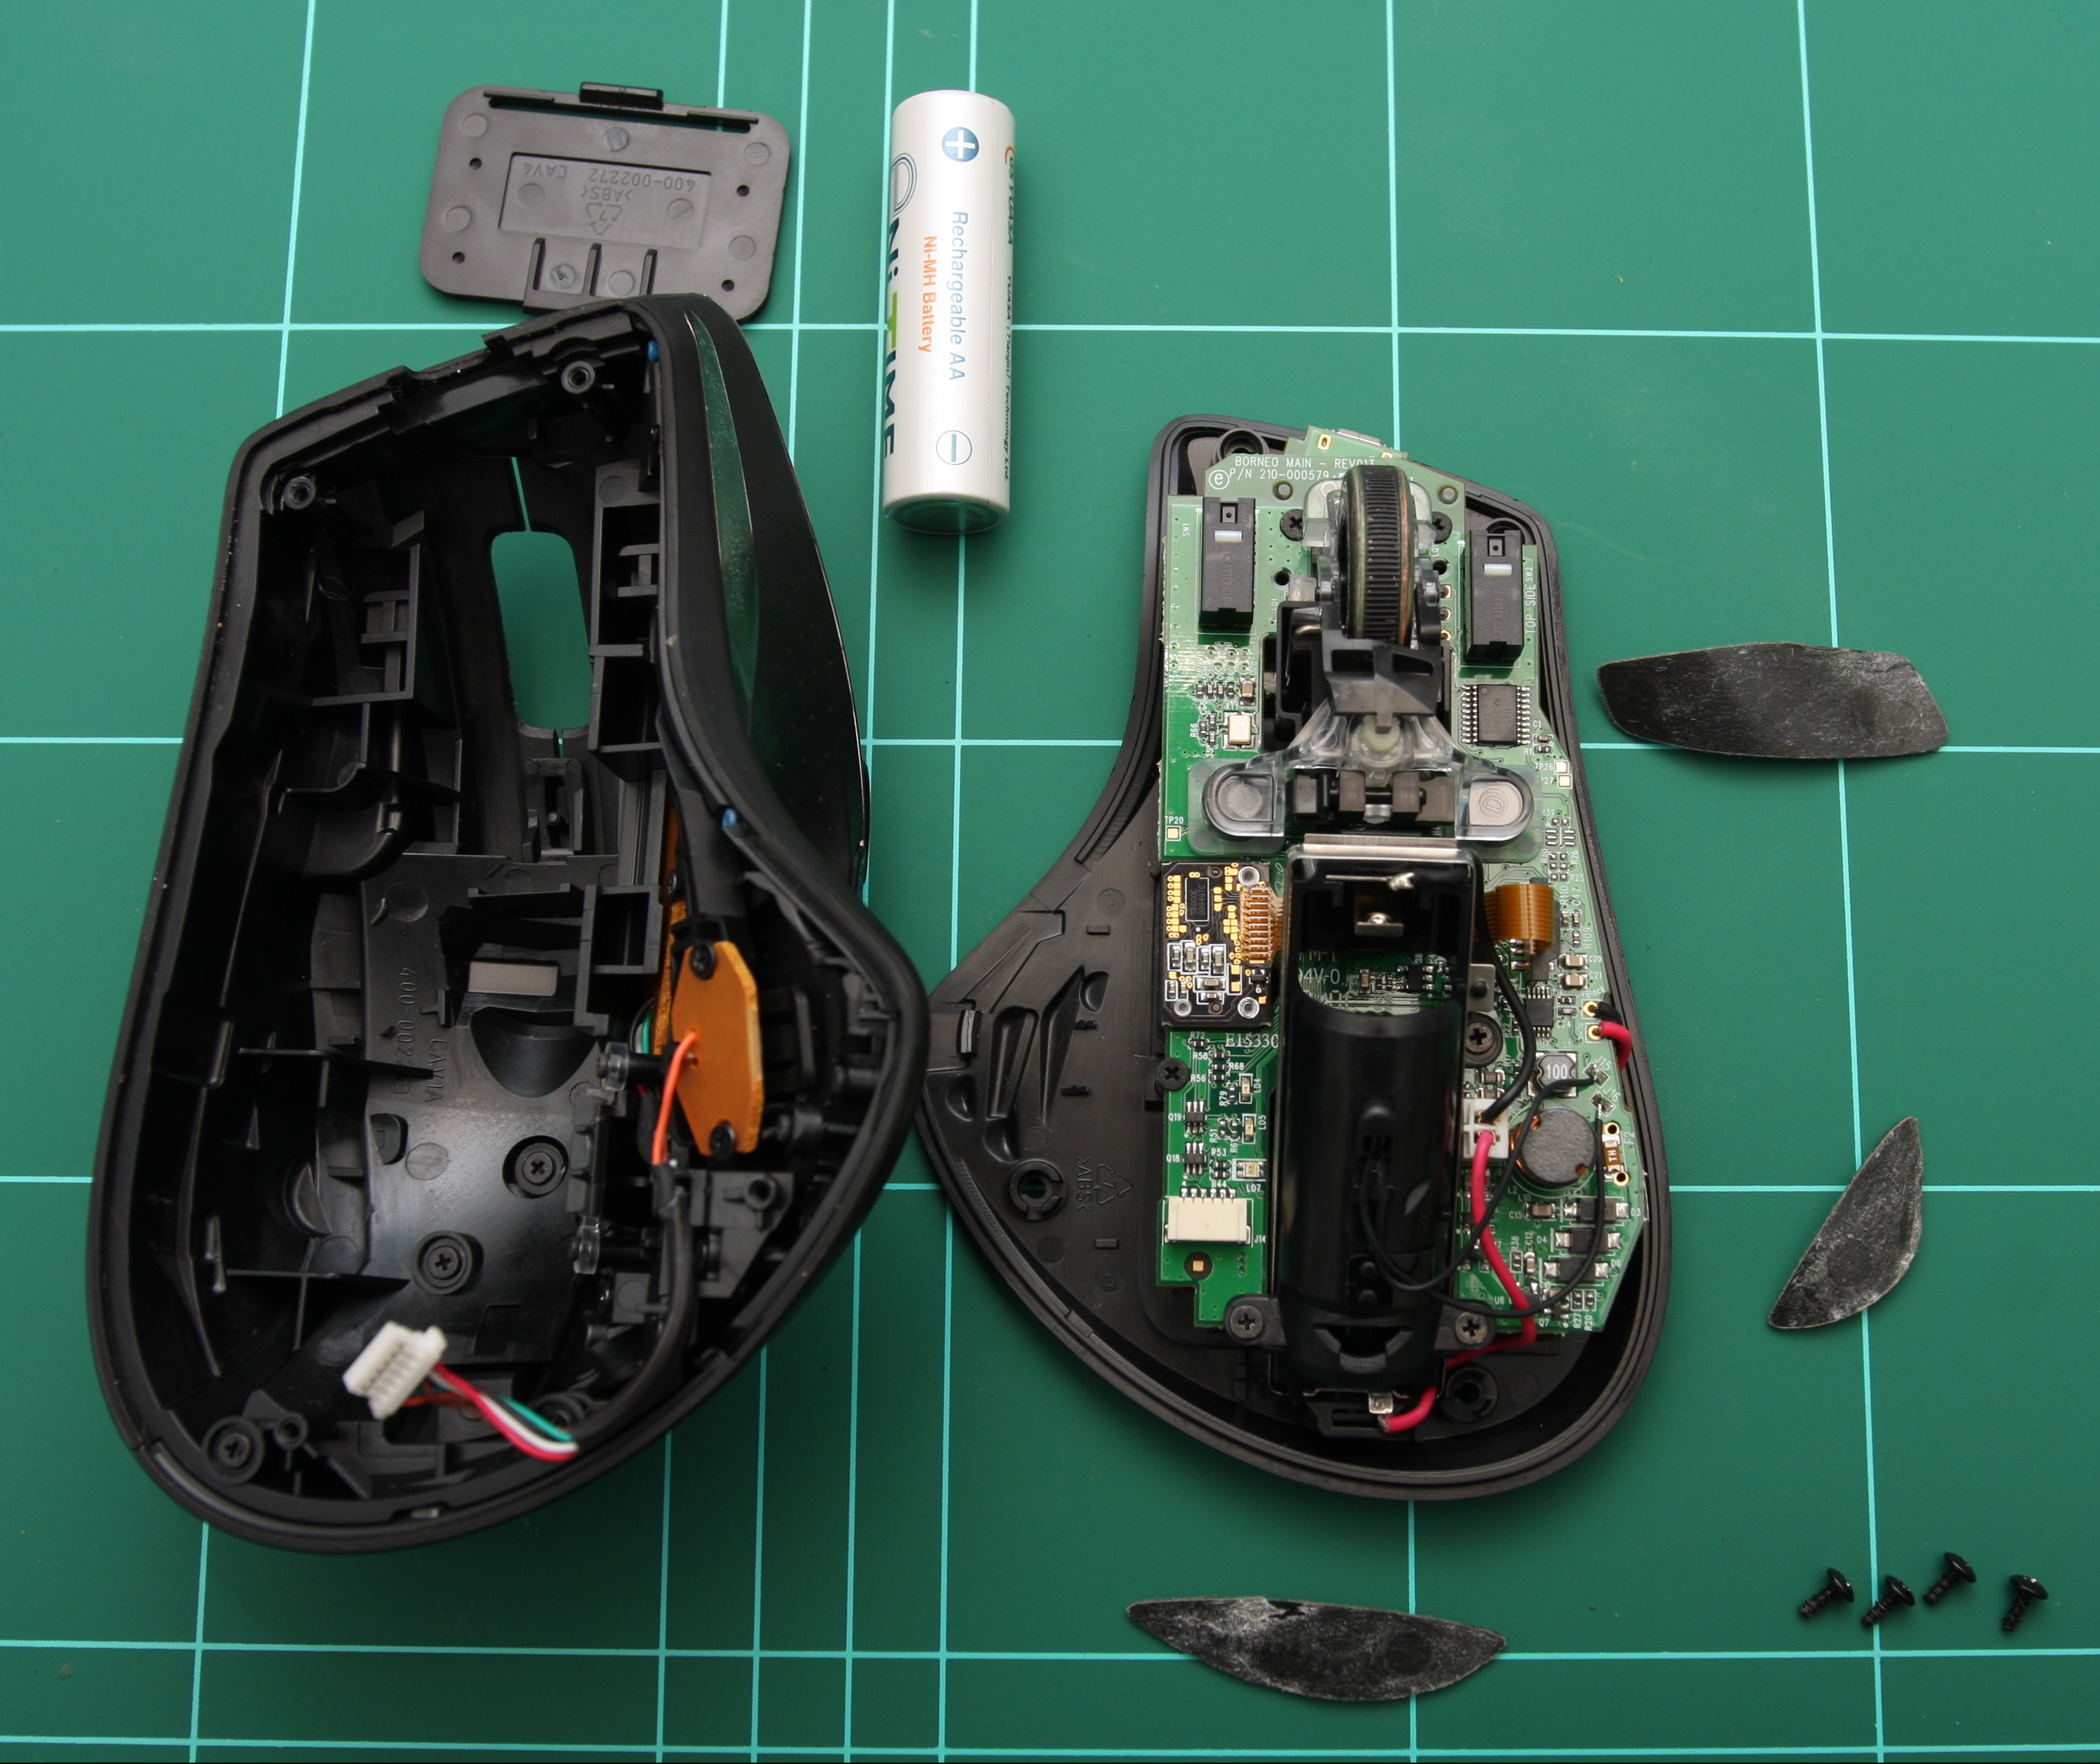 Logitech Performance MX Teardown and Repair – SteelCity Electronics